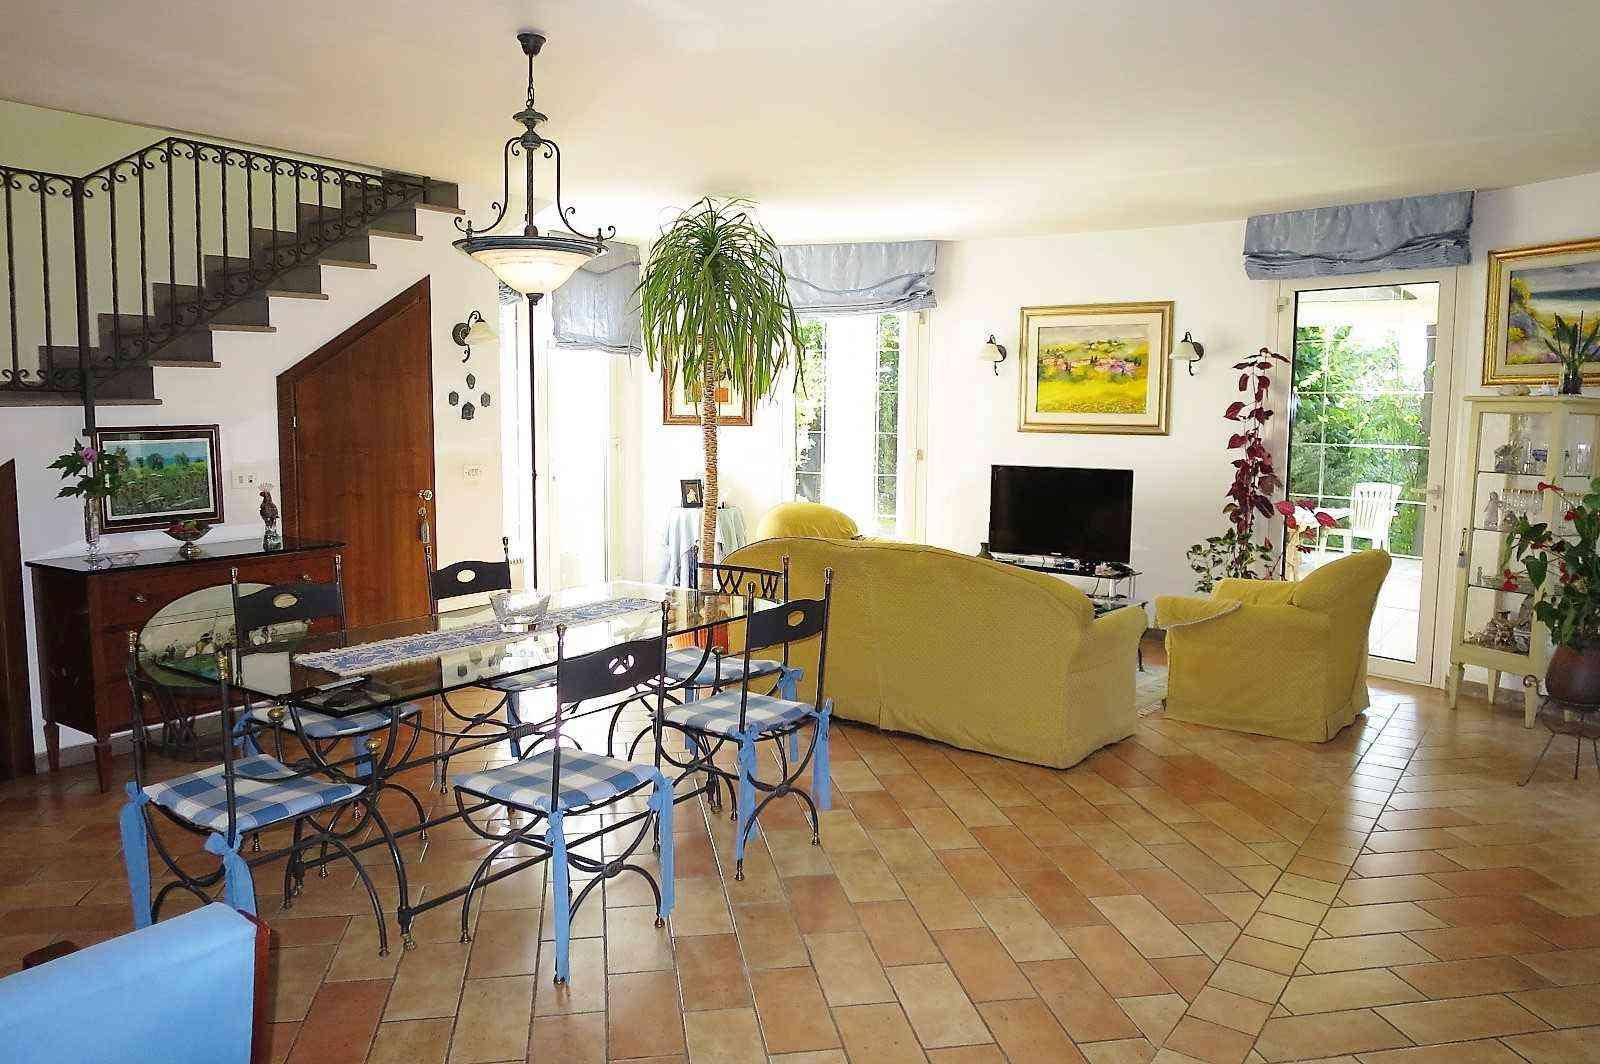 Villa Villa in vendita Atri (TE), Villa Paola - Atri - EUR 473.281 110